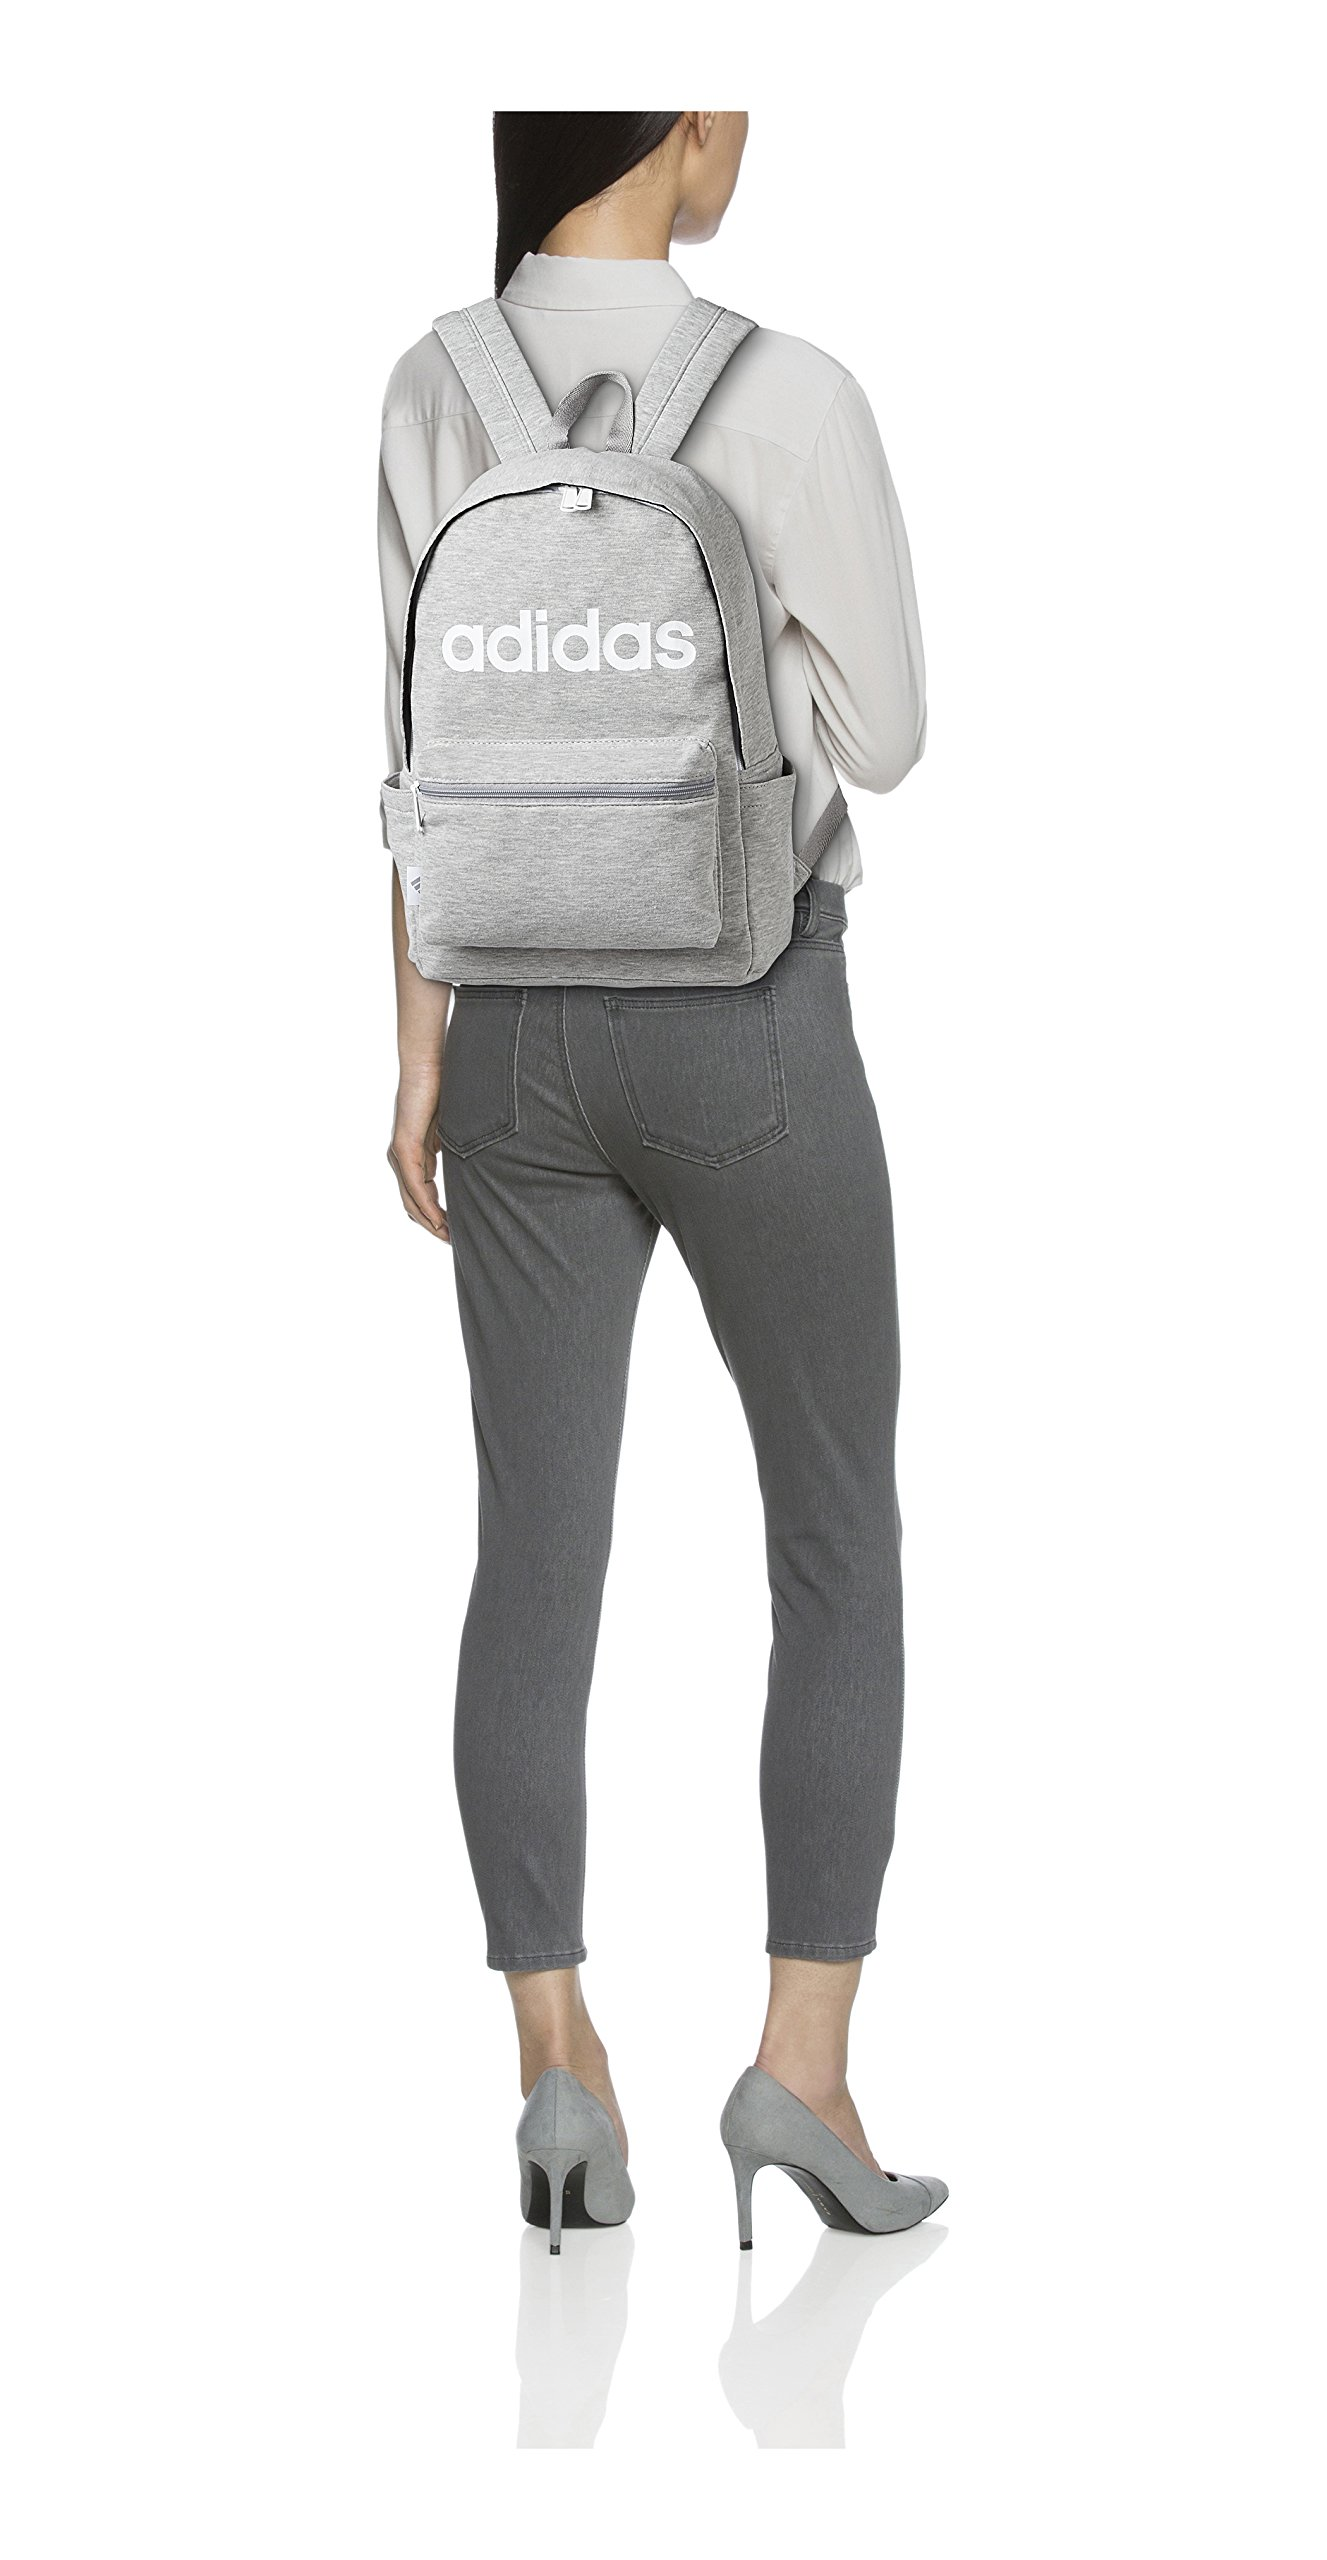 adidas Luc sport casual 42cm 17L 47423 47423 09 (medium gray heather) by adidas (Image #2)